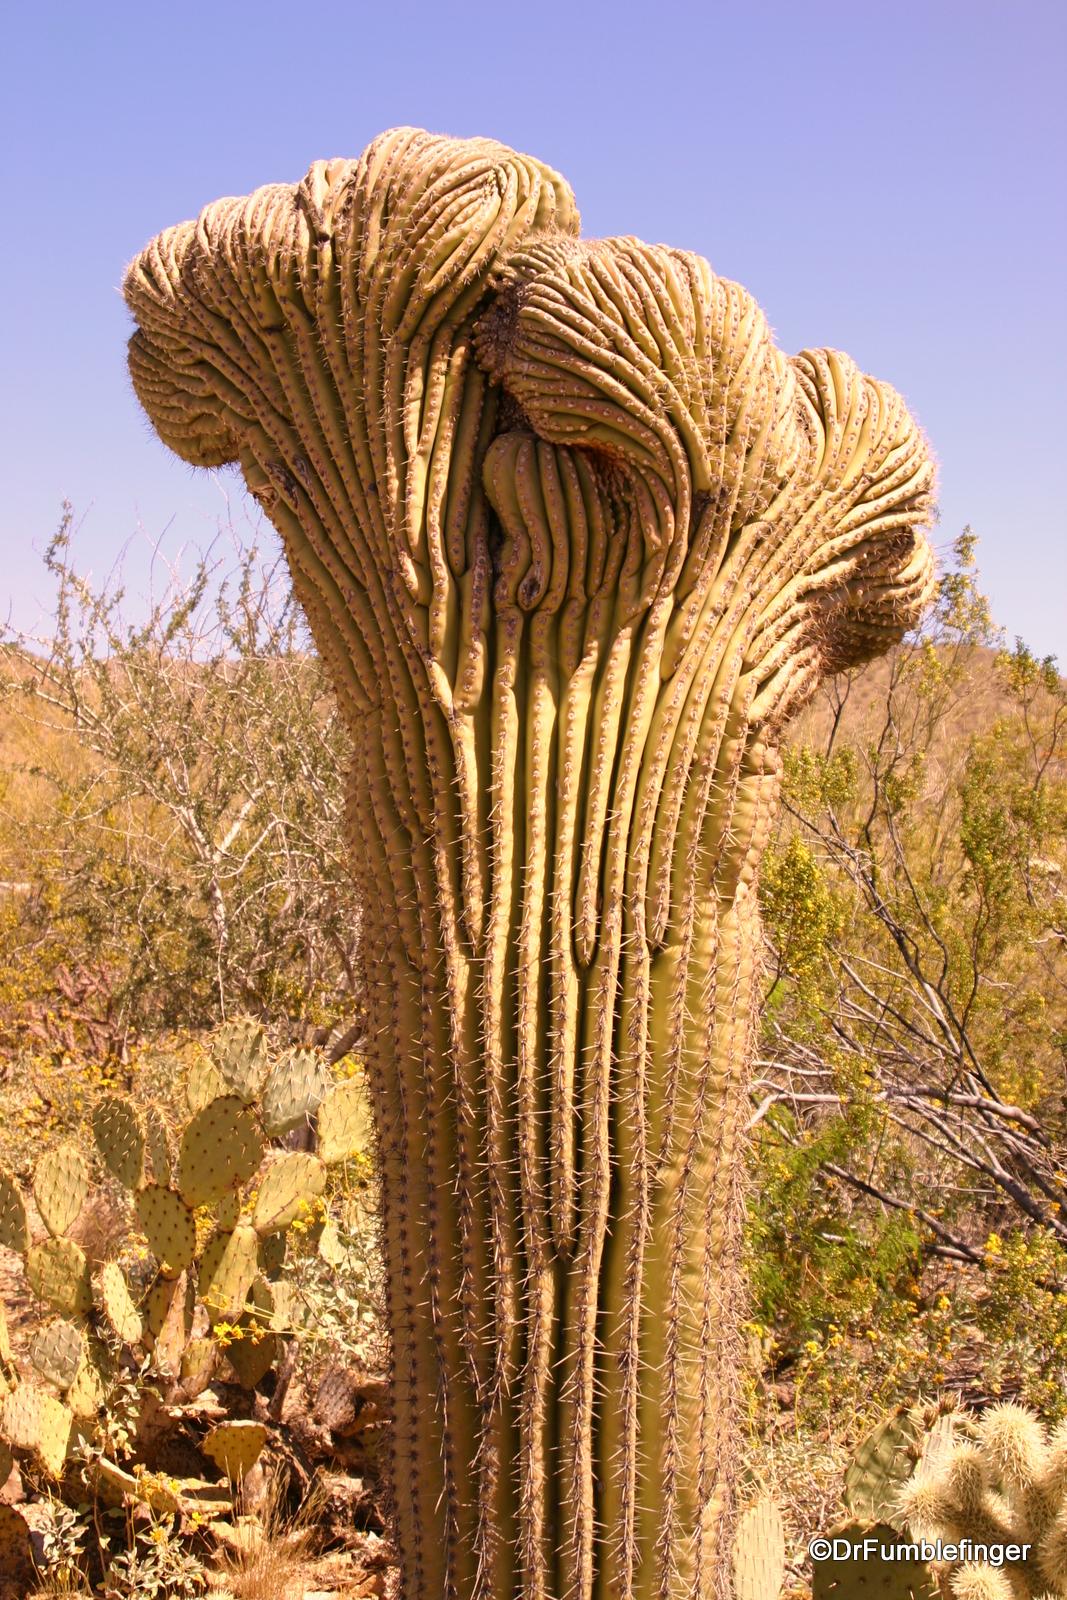 Rare variant of a saguaro cactus